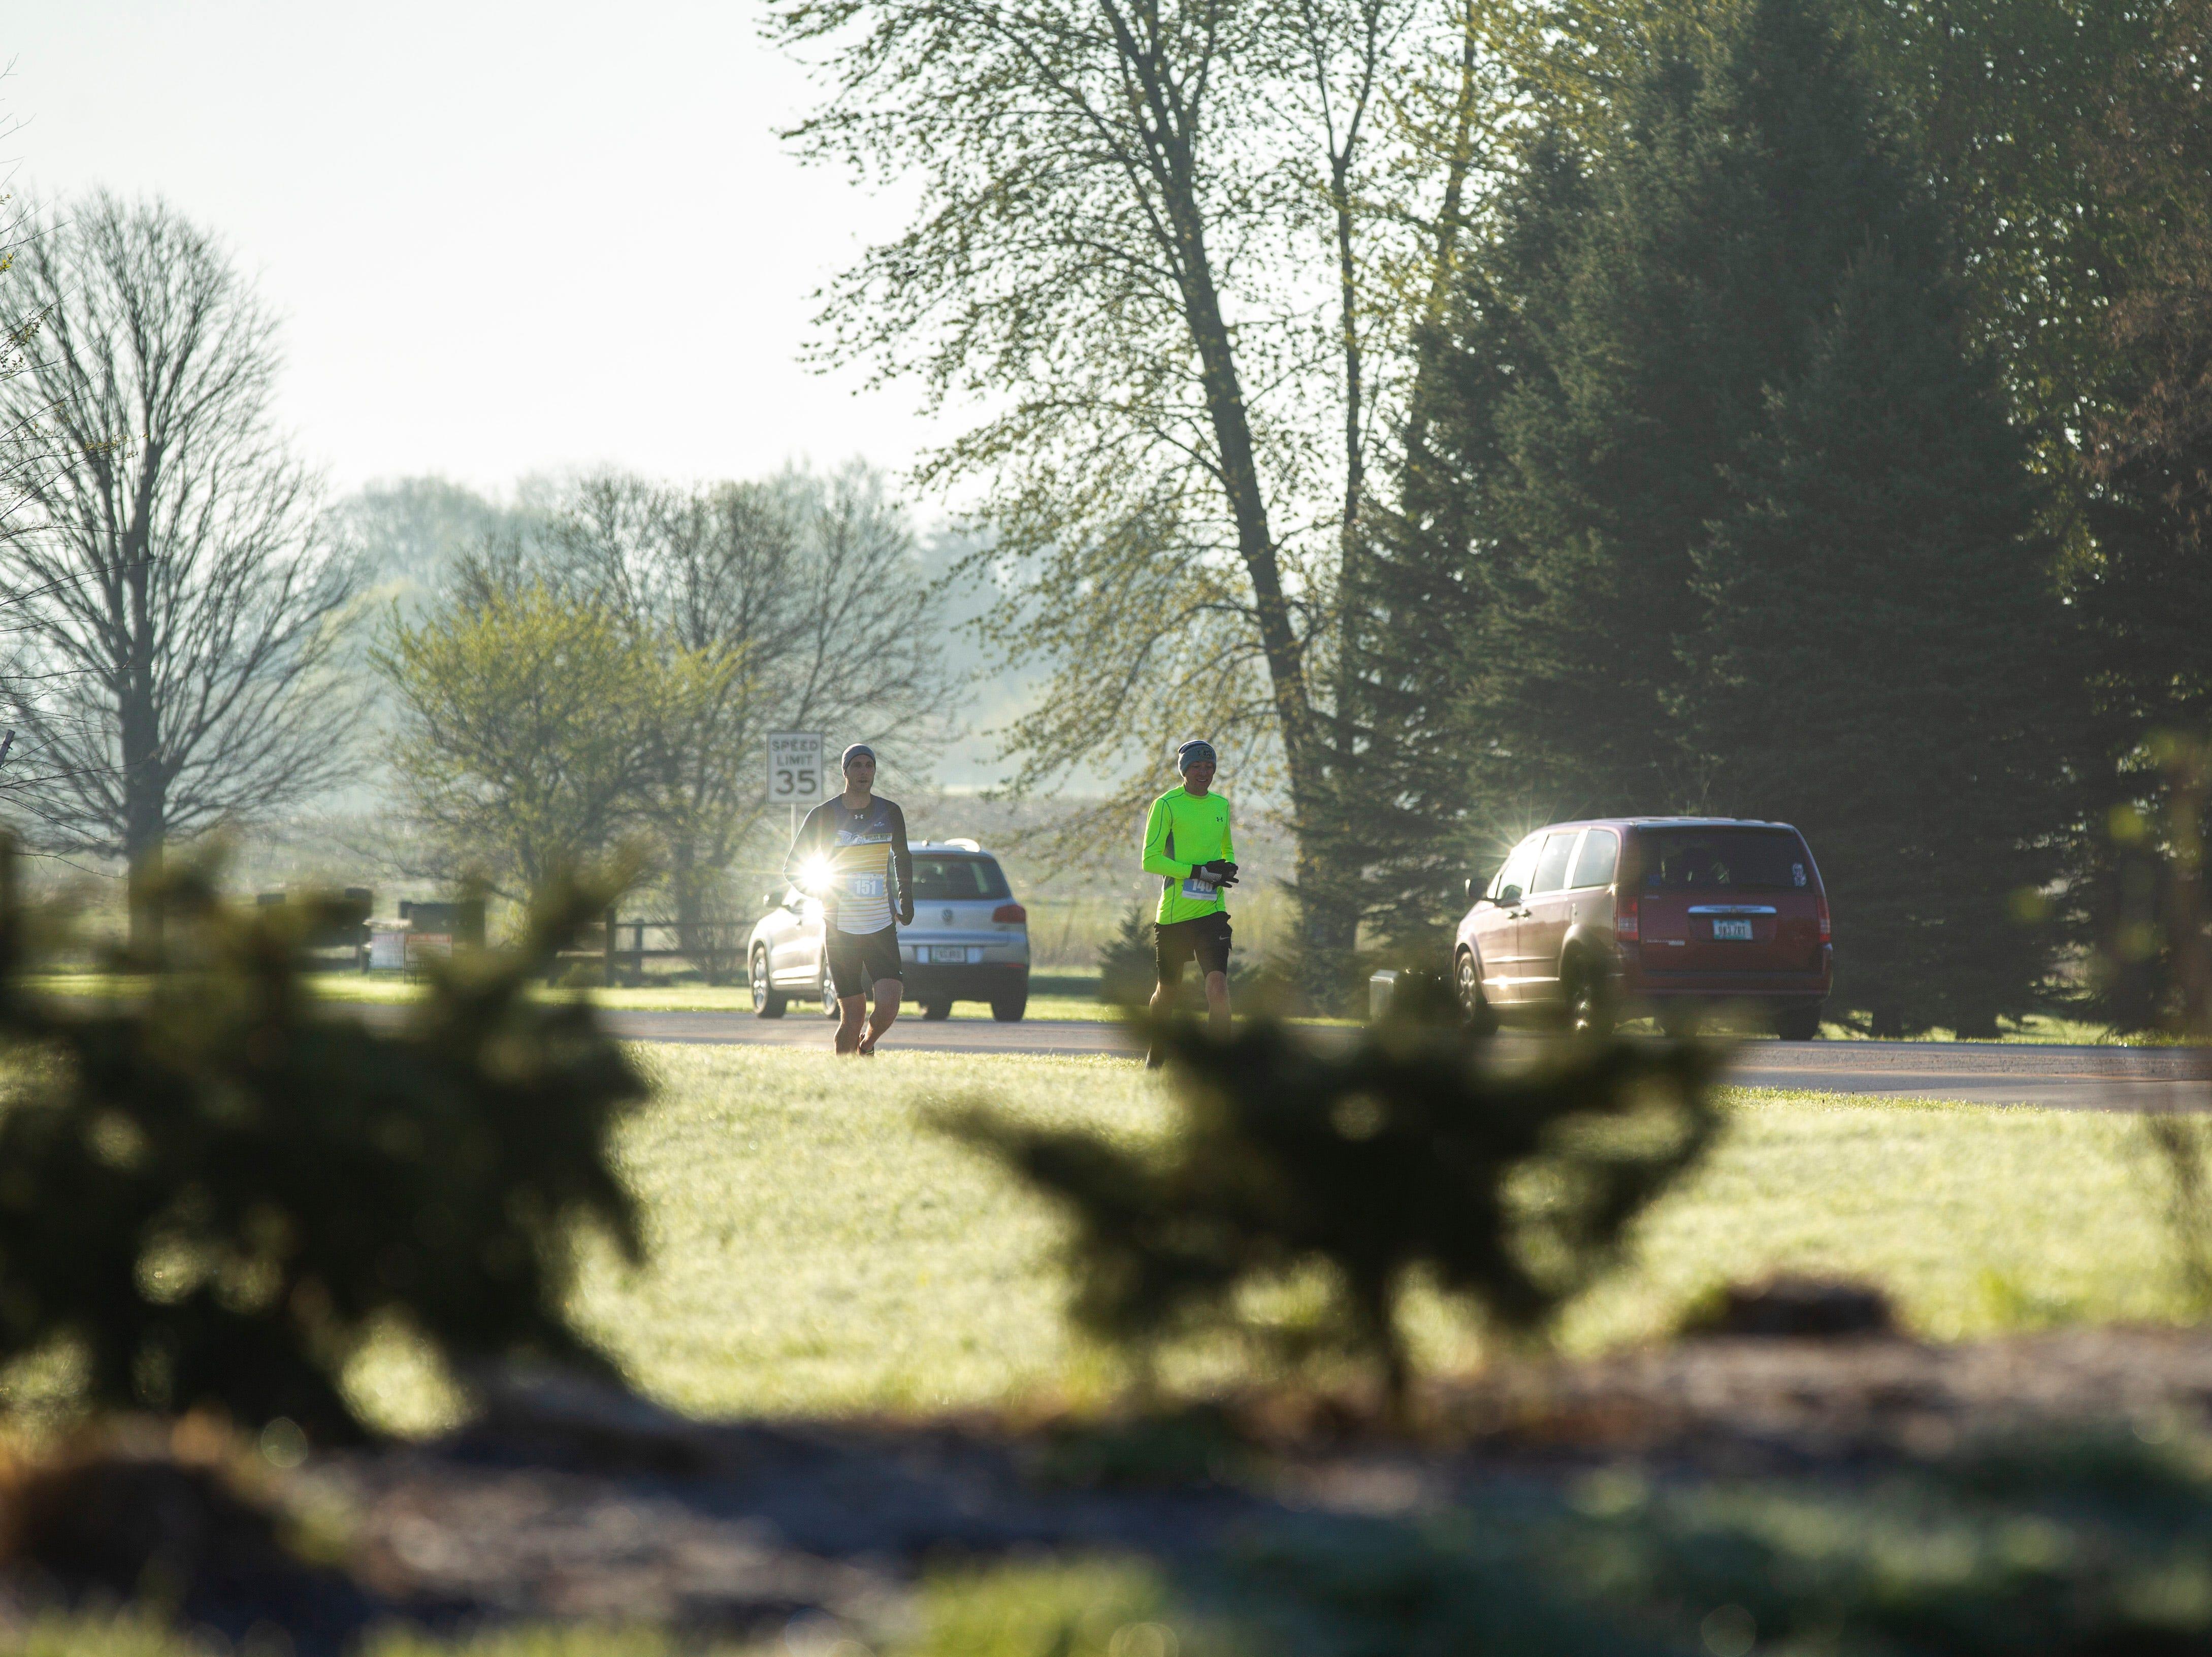 Tad Hulst, left, and Derek Henscheid run during the second annual Run CRANDIC marathon, Sunday, April 28, 2019, along Dubuque Street in North Liberty, Iowa.